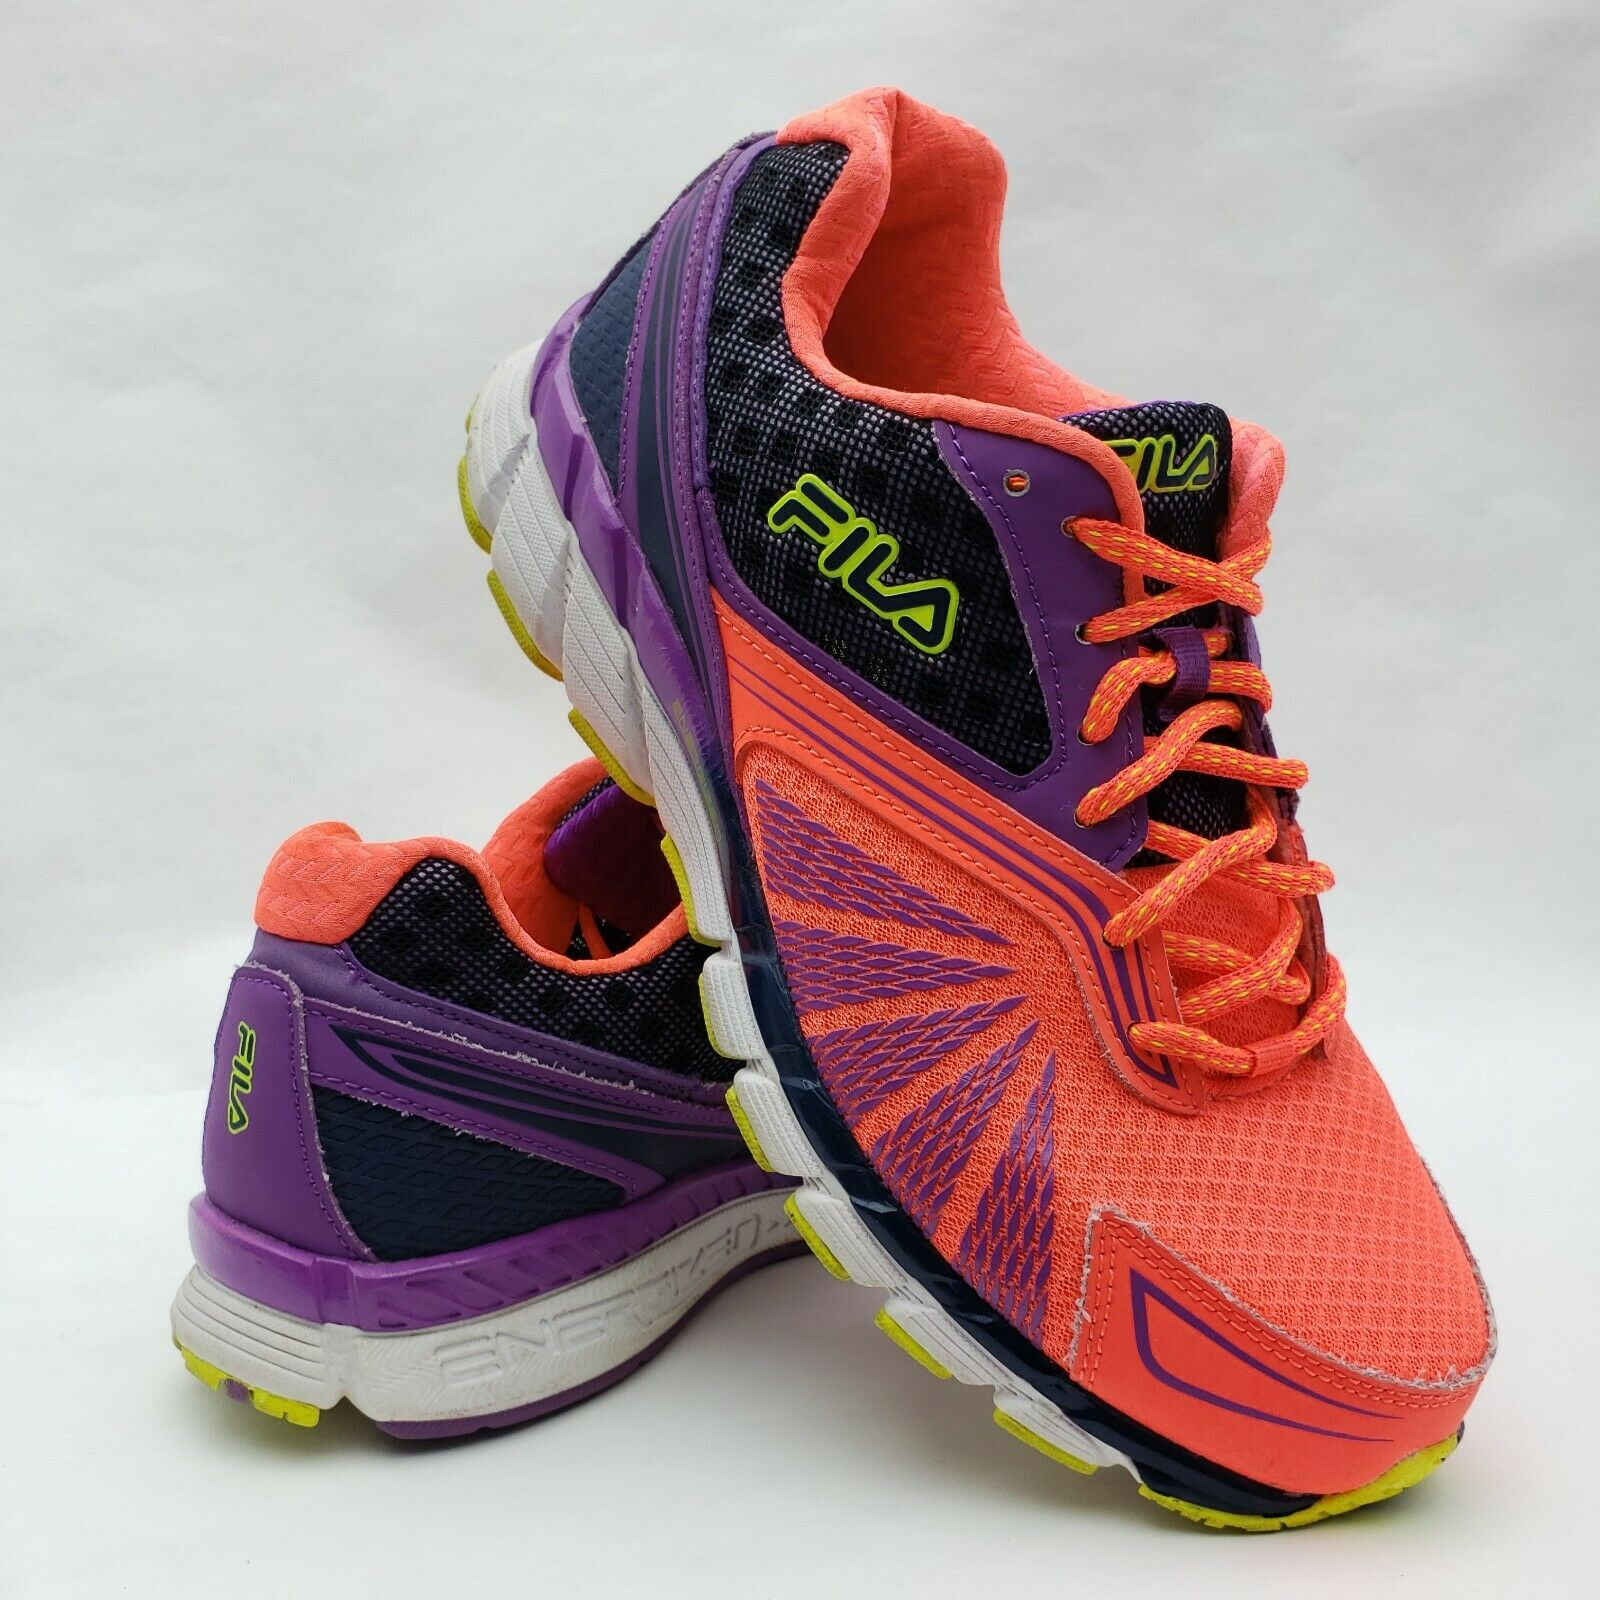 FILA Sprint EVO Memory Foam Athletic